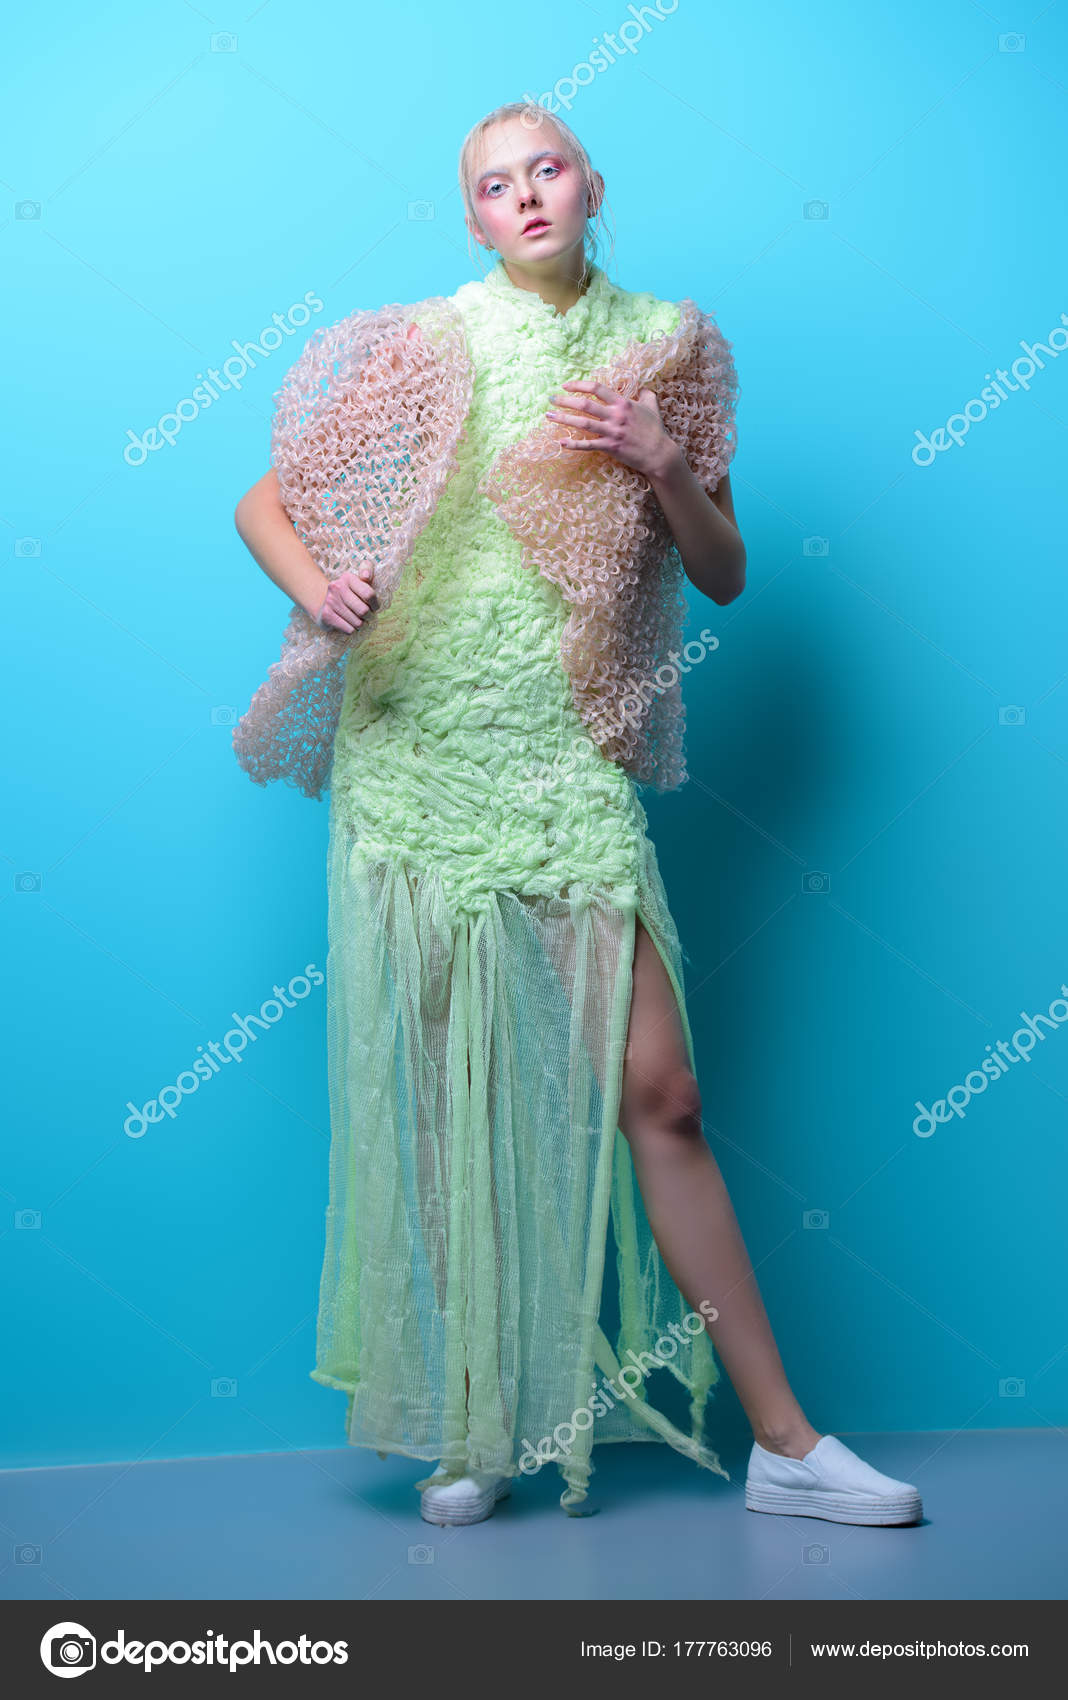 a8e000444c ασυνήθιστα δημιουργικά ρούχα — Φωτογραφία Αρχείου © prometeus  177763096